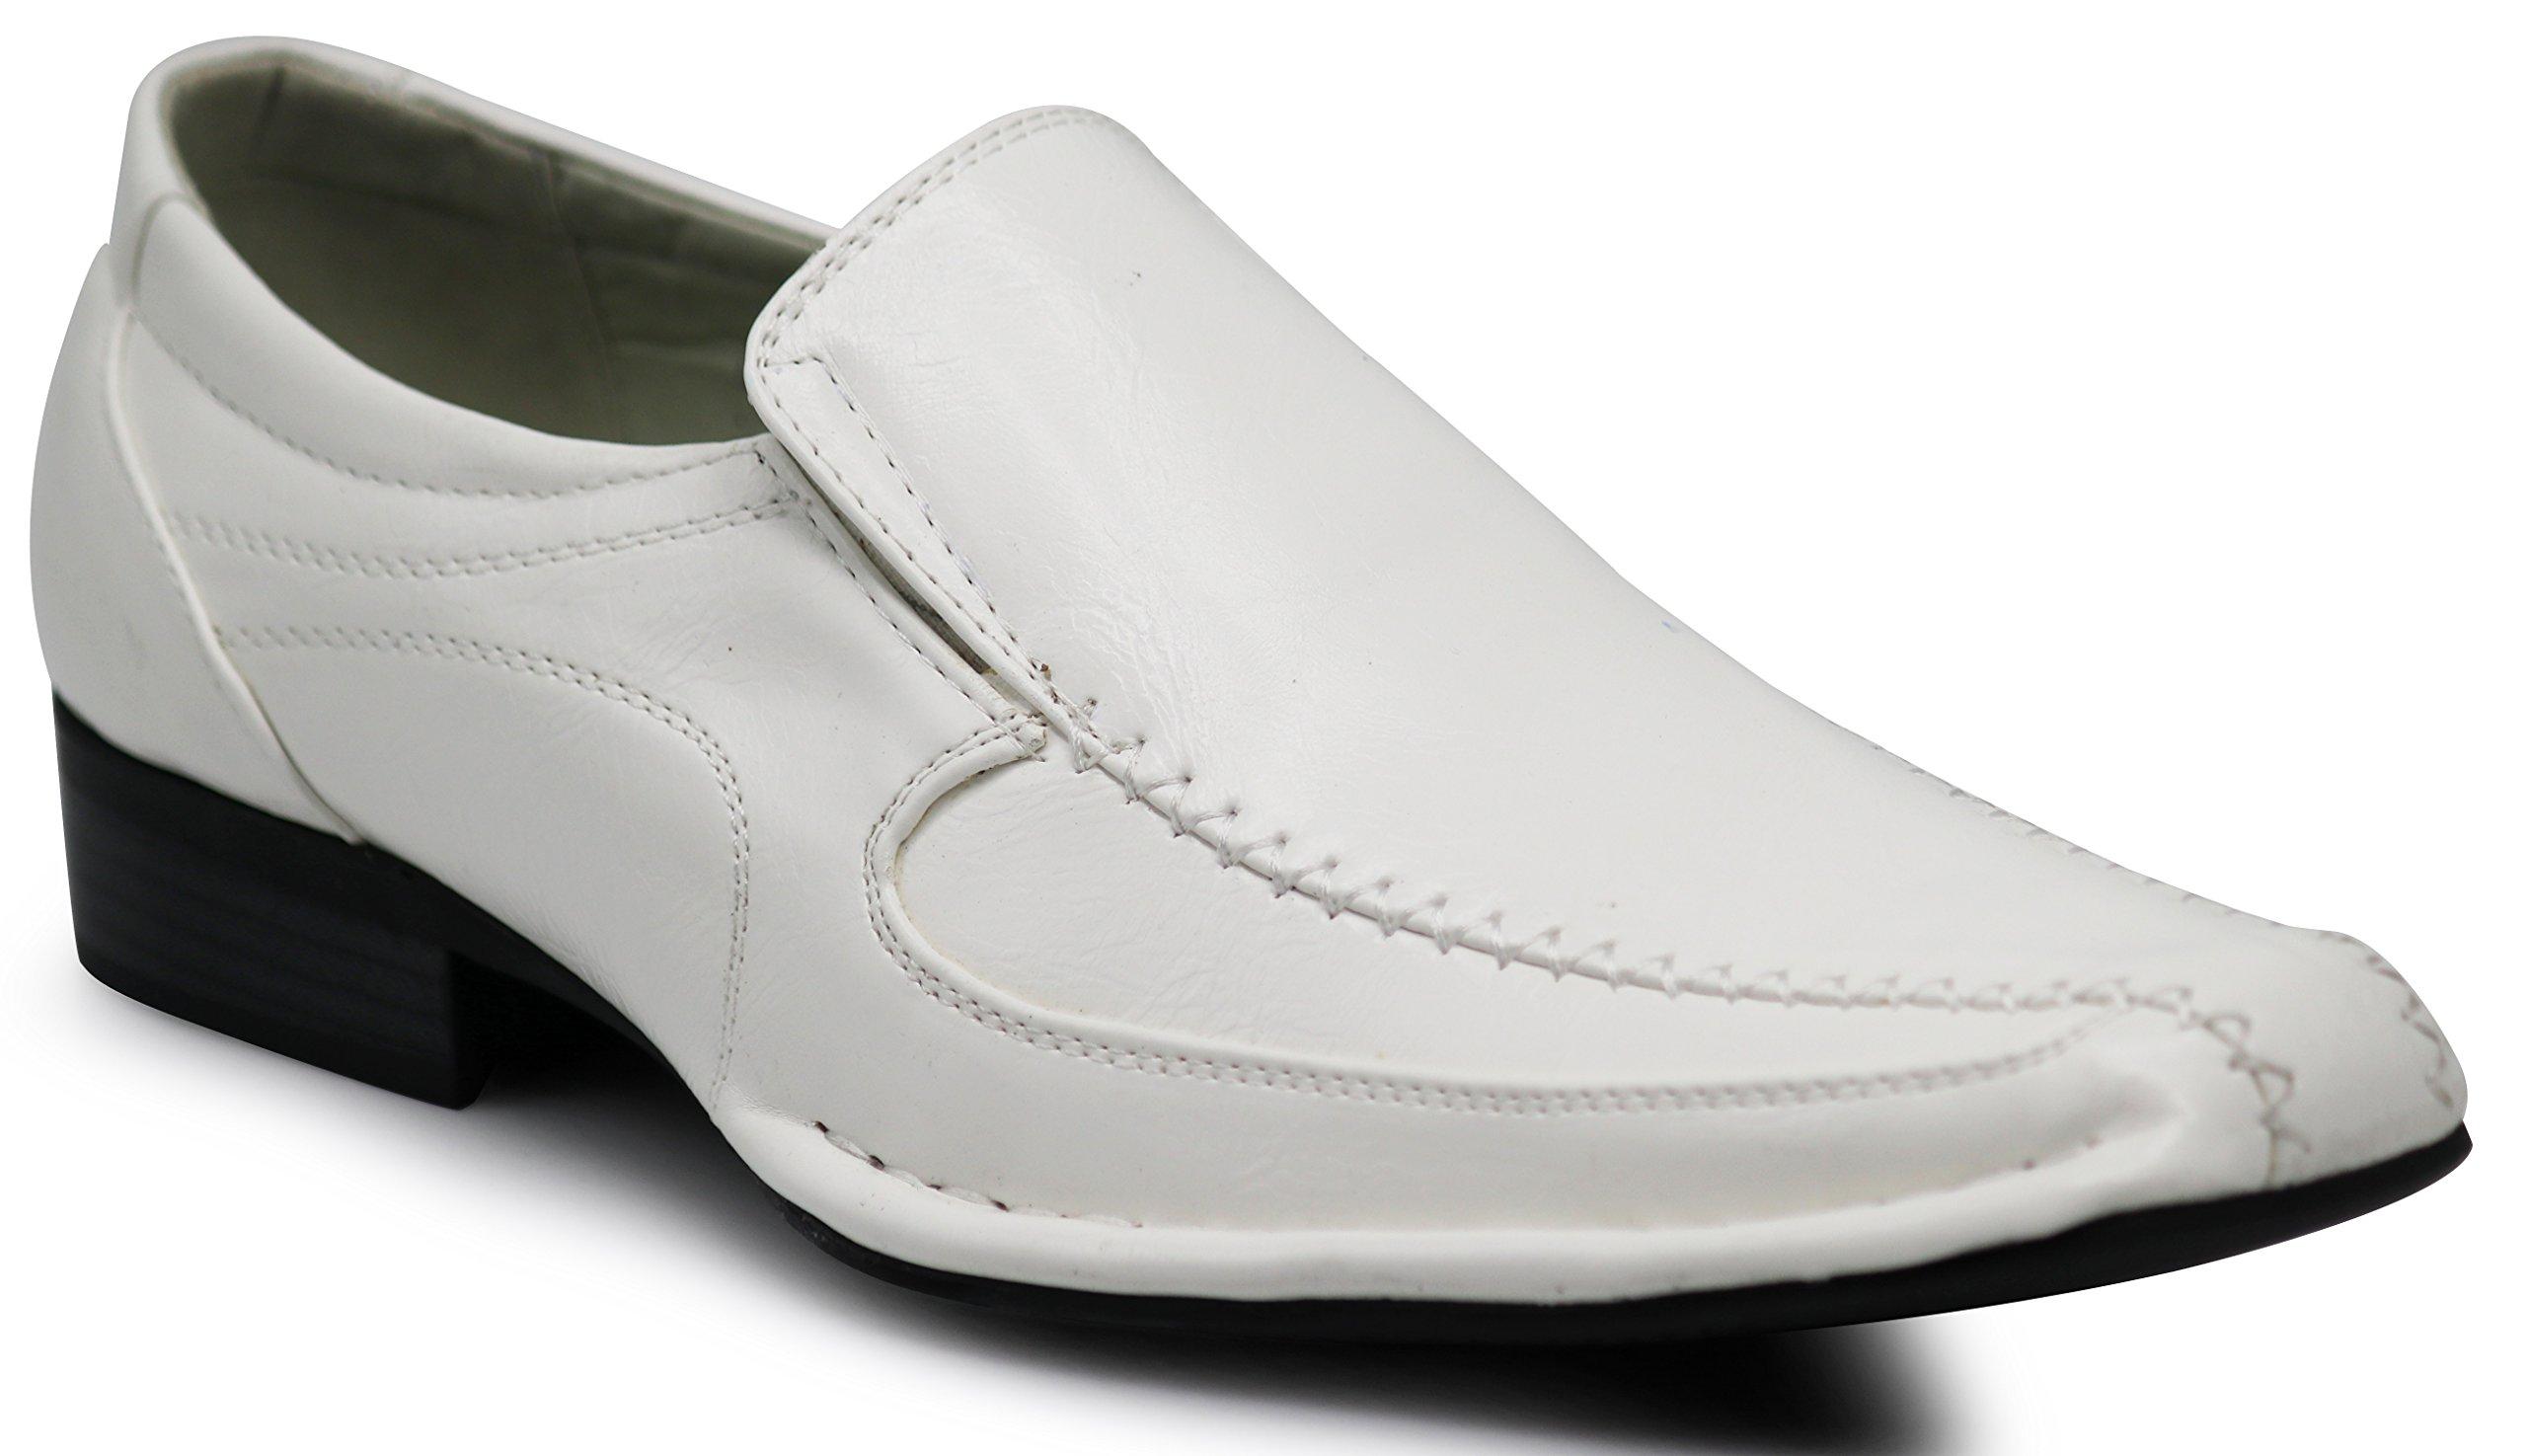 Enzo Romeo ND2 Men's Dress Bike Toe Loafers Elastic Slip on with Plain Fashion Shoes (10.5 D(M) US, White)